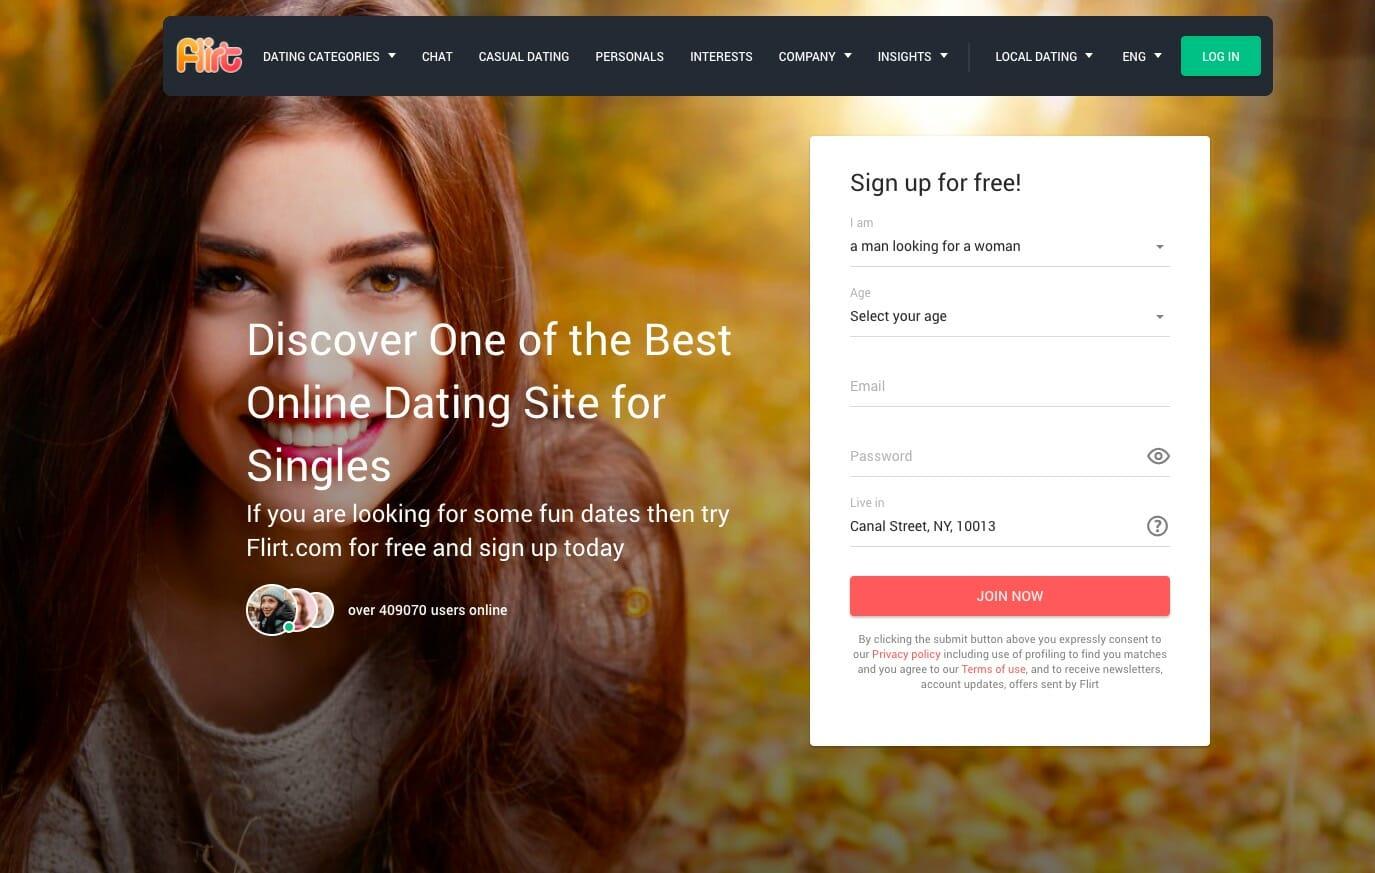 Pagina principale di Flirt.com